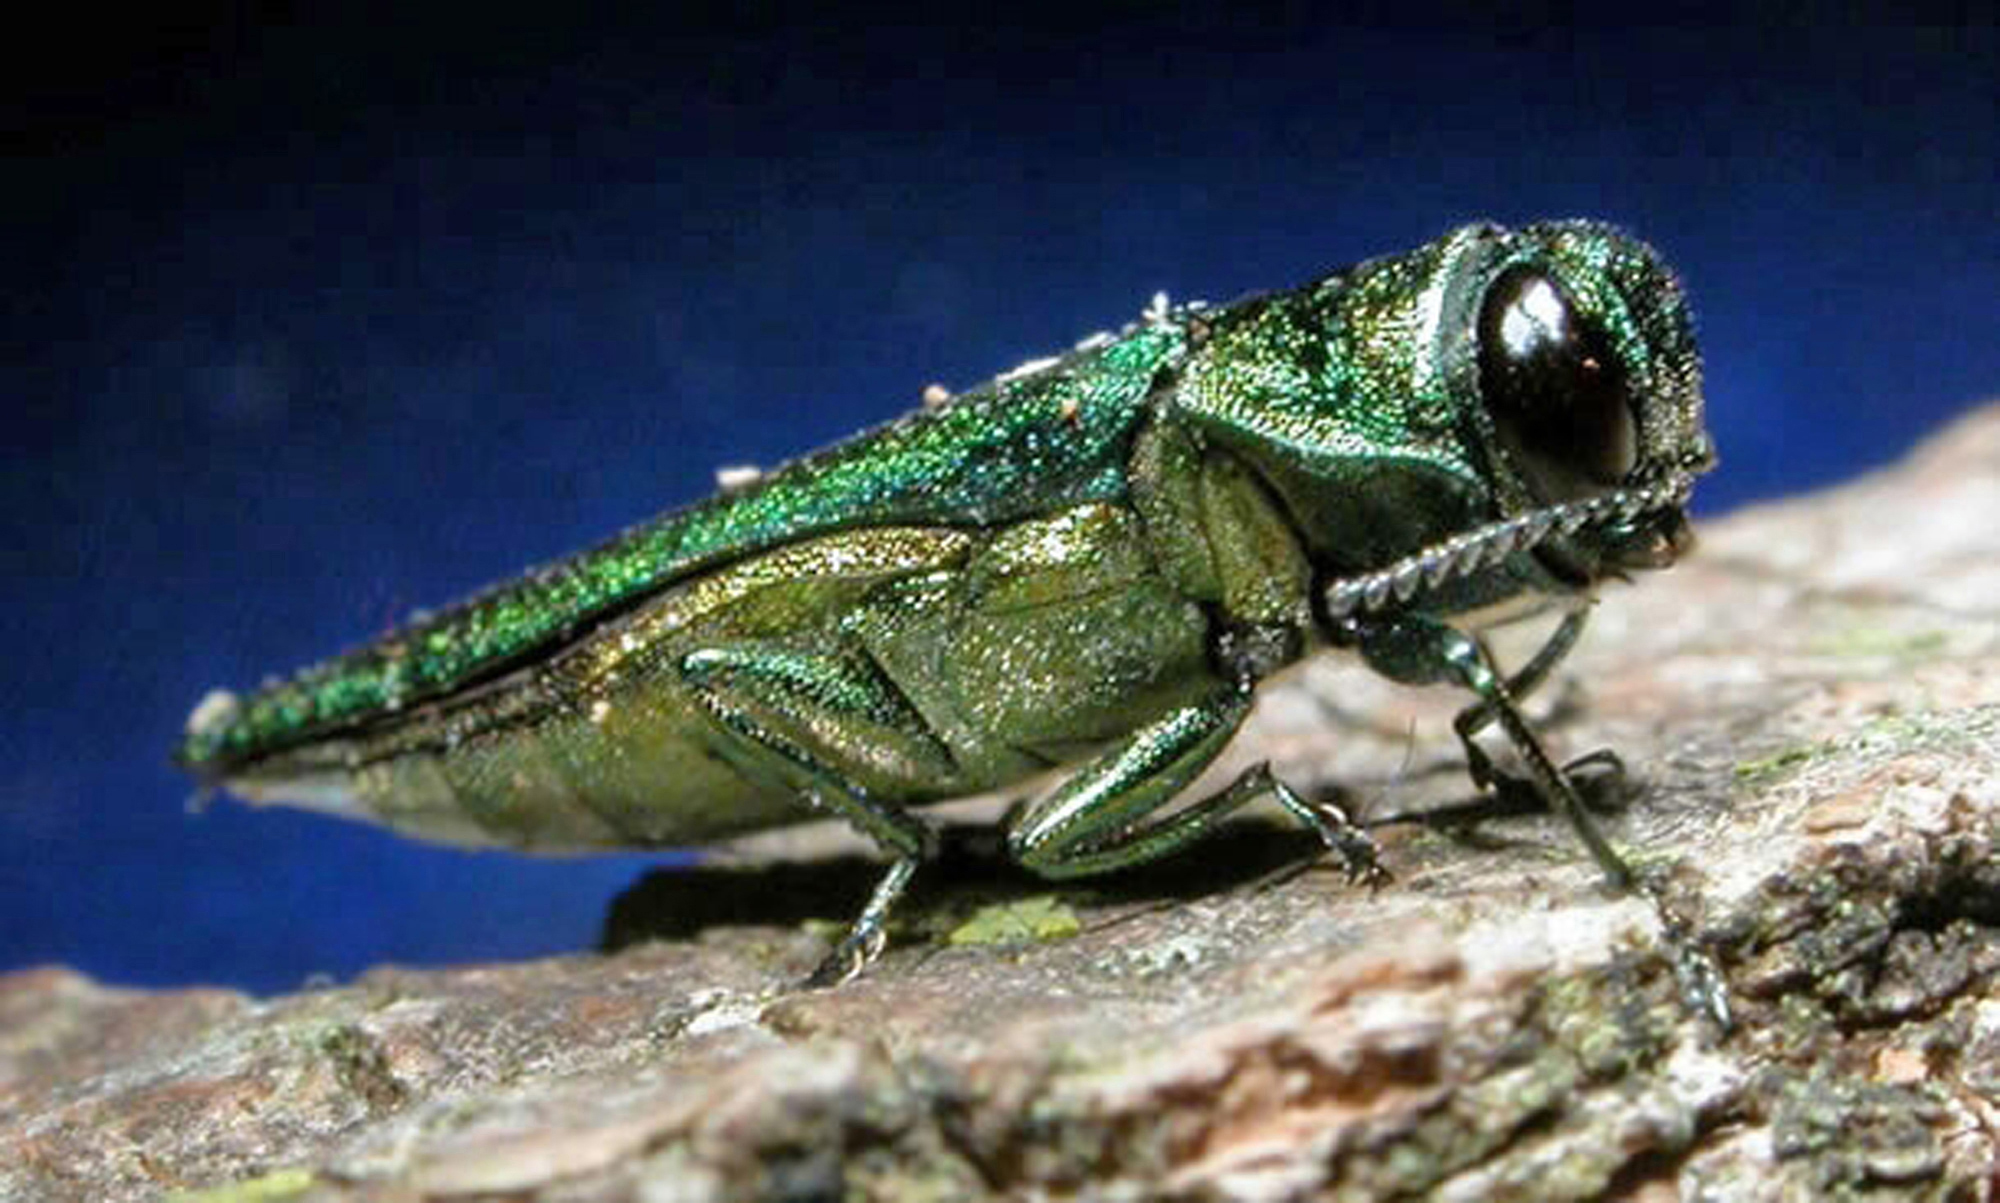 Fight against Emerald Ash Borer spreads